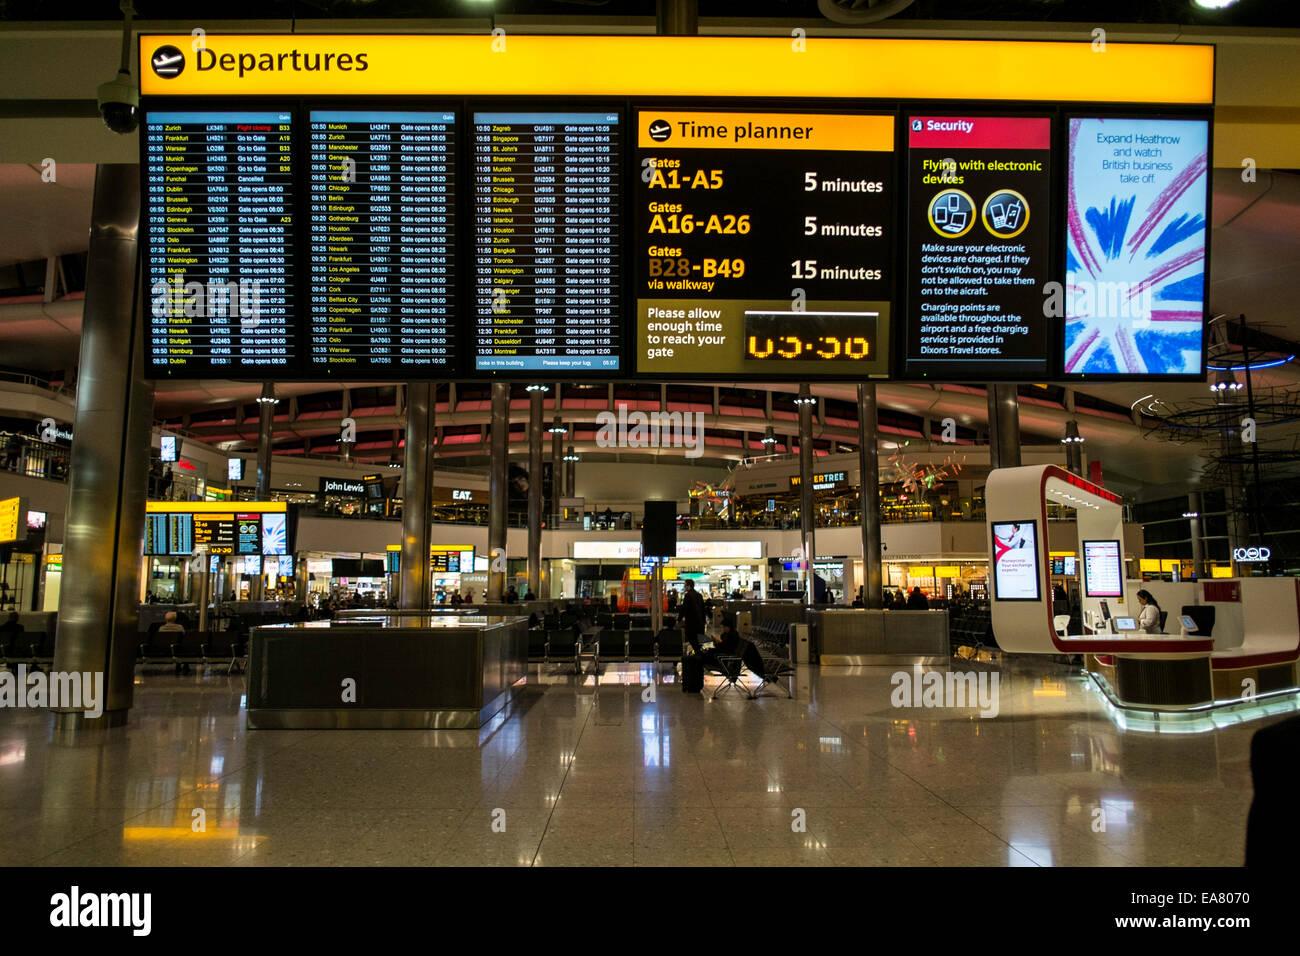 Terminal 2, Heathrow Airport, London, United Kingdom - Stock Image